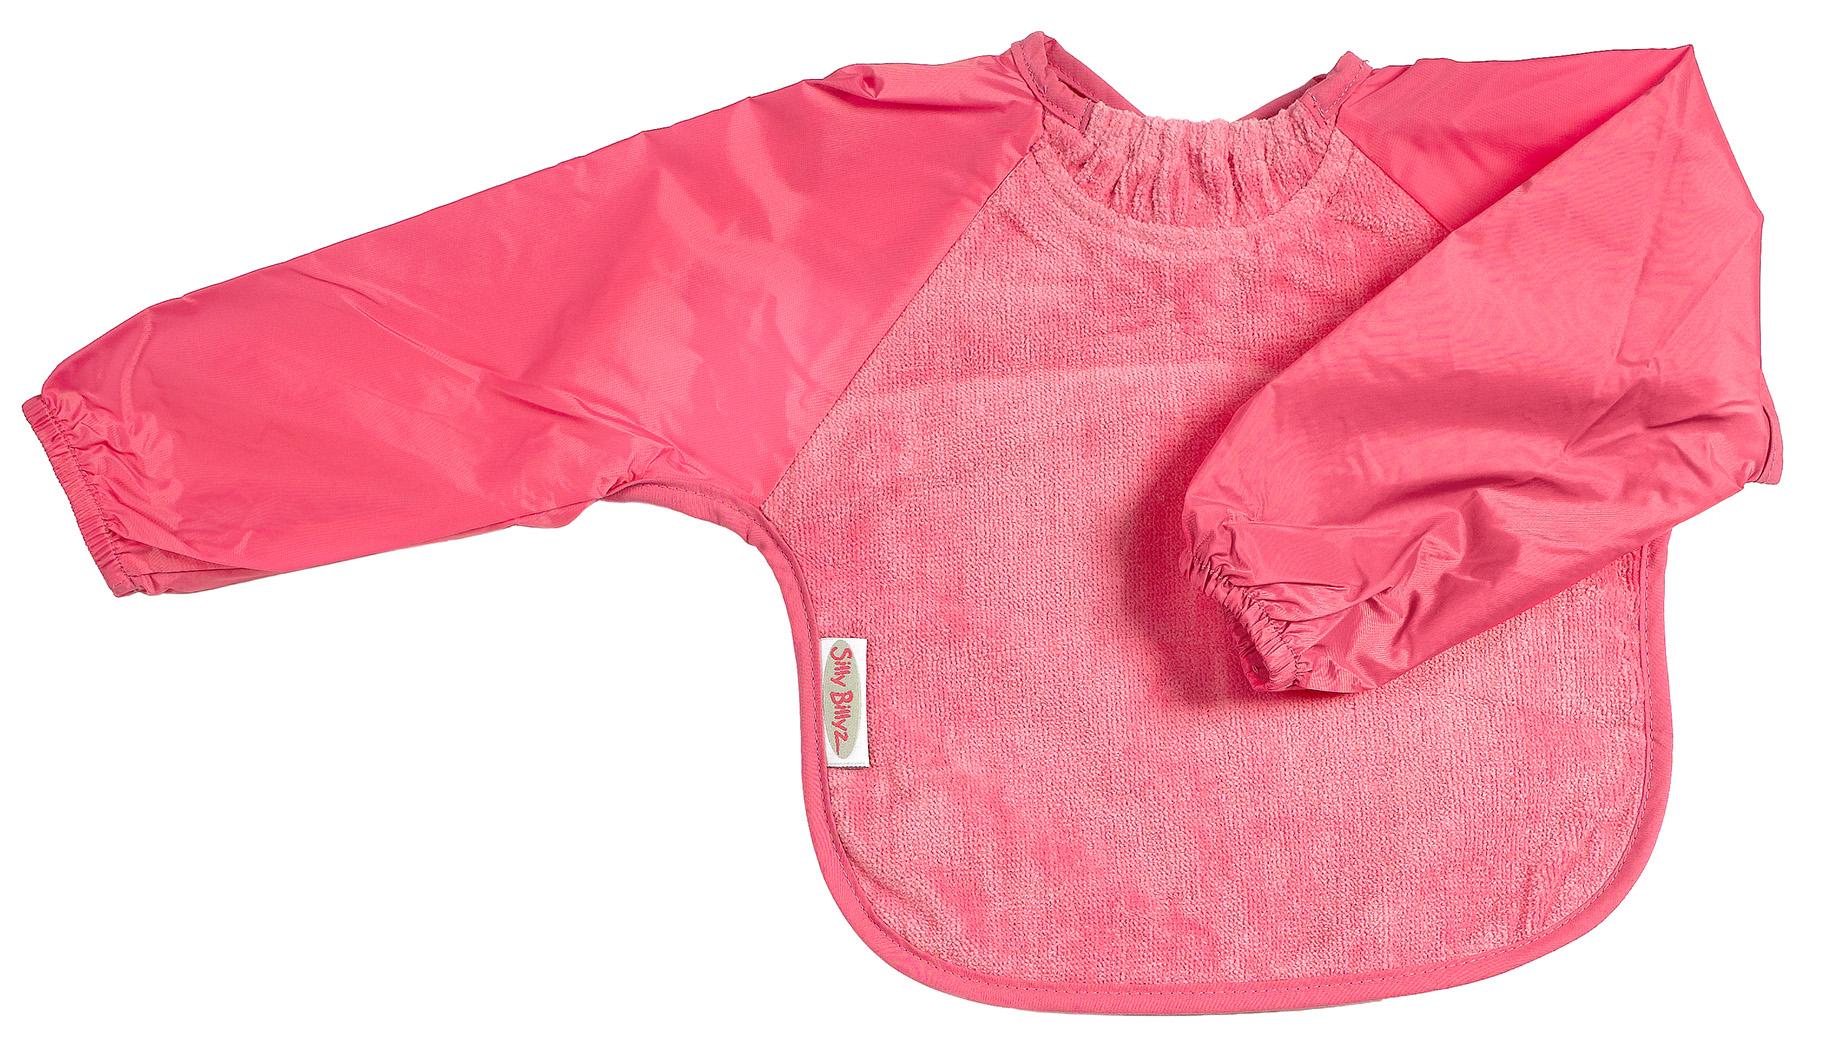 silly billyz cerise pink baby bibs towel fleece. Black Bedroom Furniture Sets. Home Design Ideas